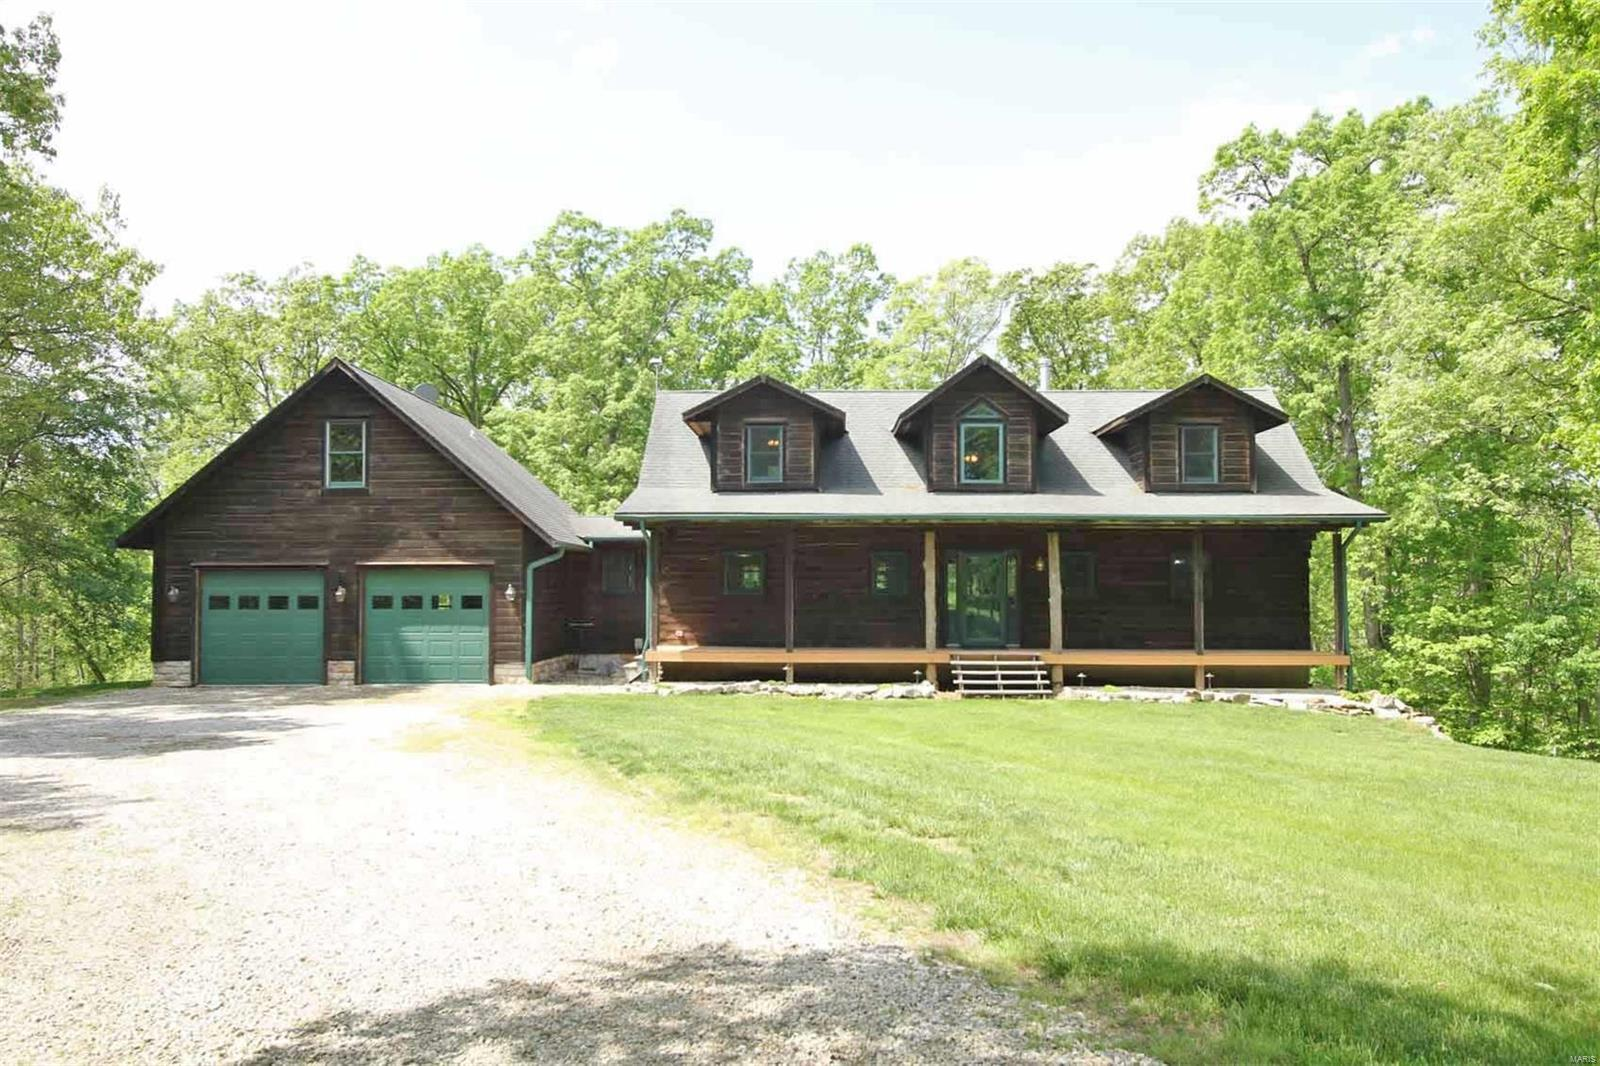 15529 Bunse Way Property Photo - Jerseyville, IL real estate listing